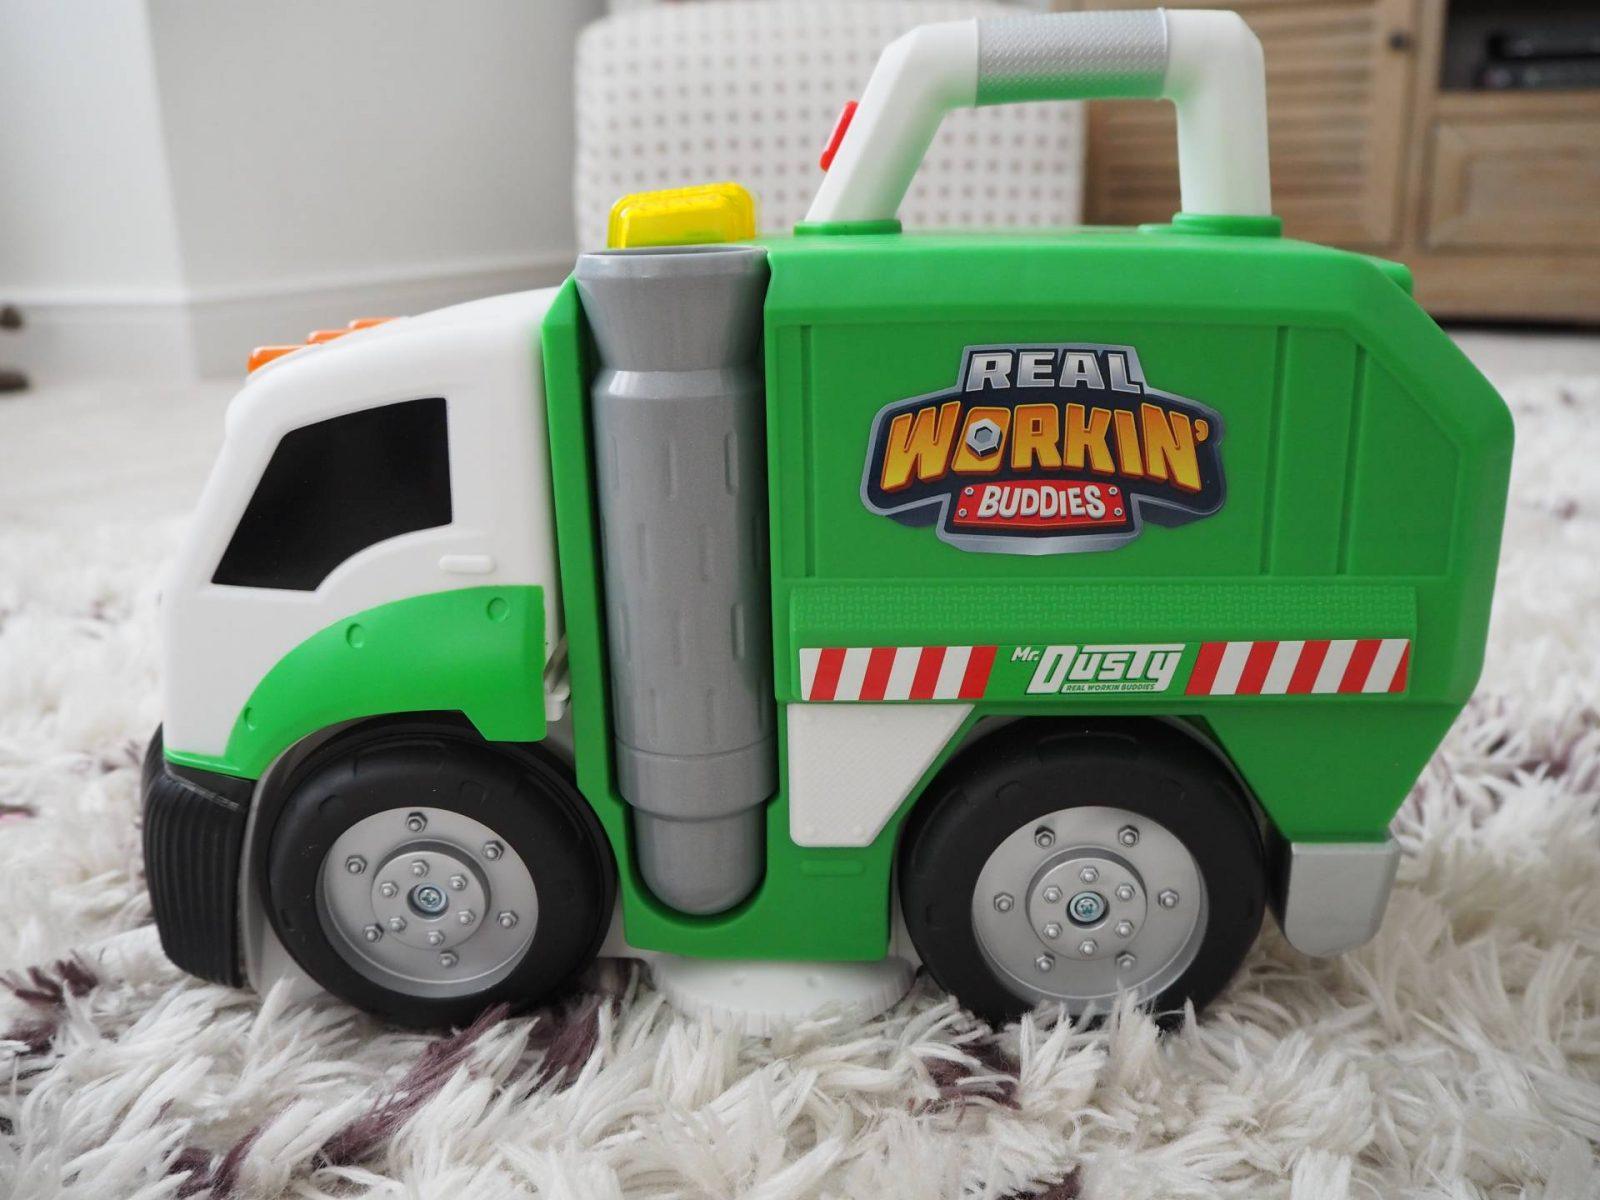 Meet Dusty The Garbage Truck…